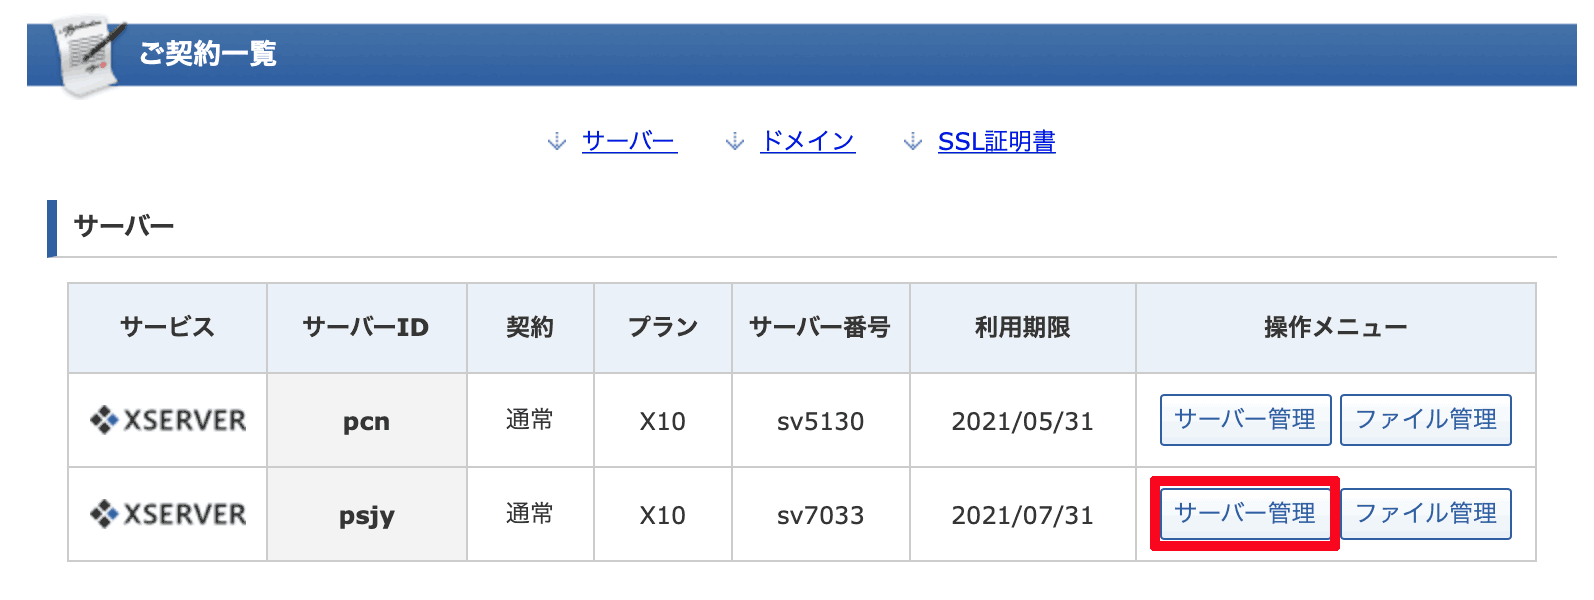 Xserver サーバー管理